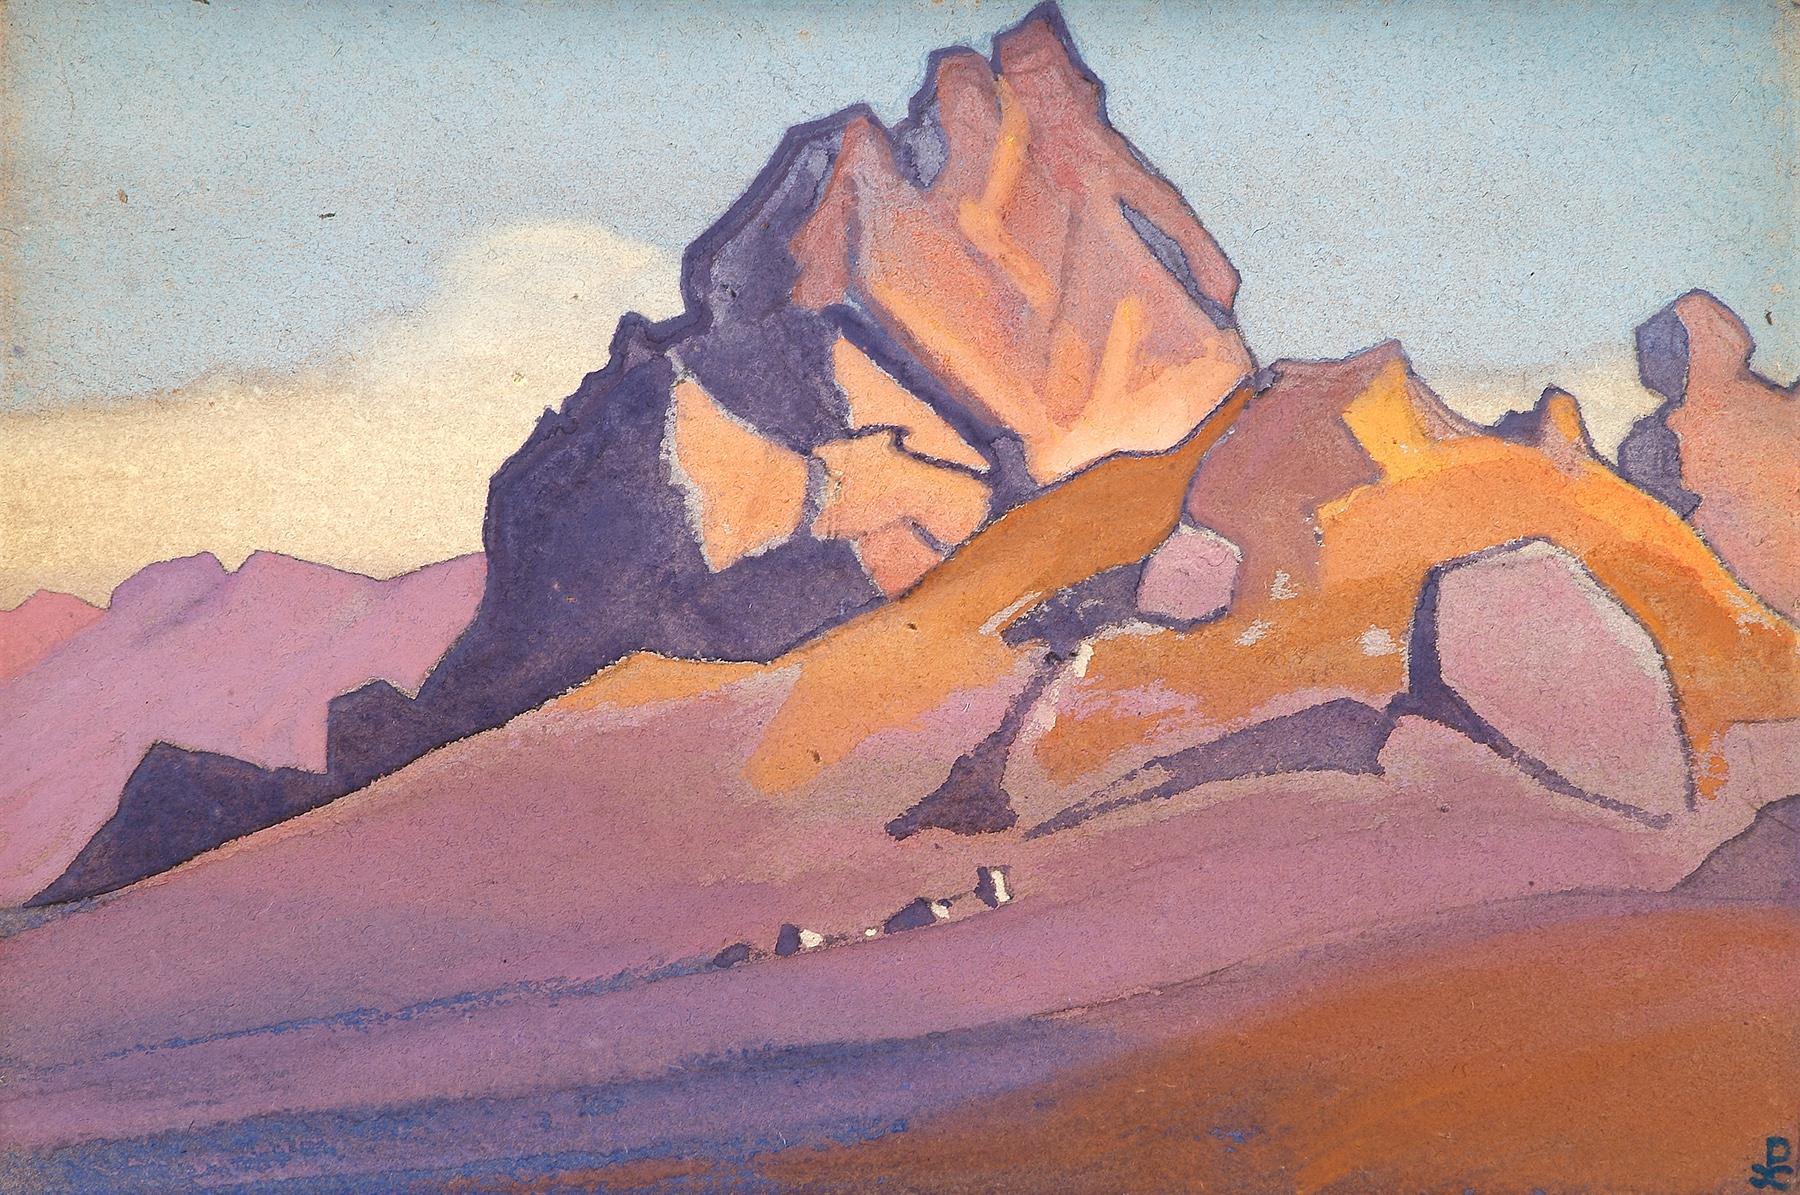 Картина Н.К.Рериха. Тимур Хада, стоянка экспедиции. [Тимур Хада] 1936